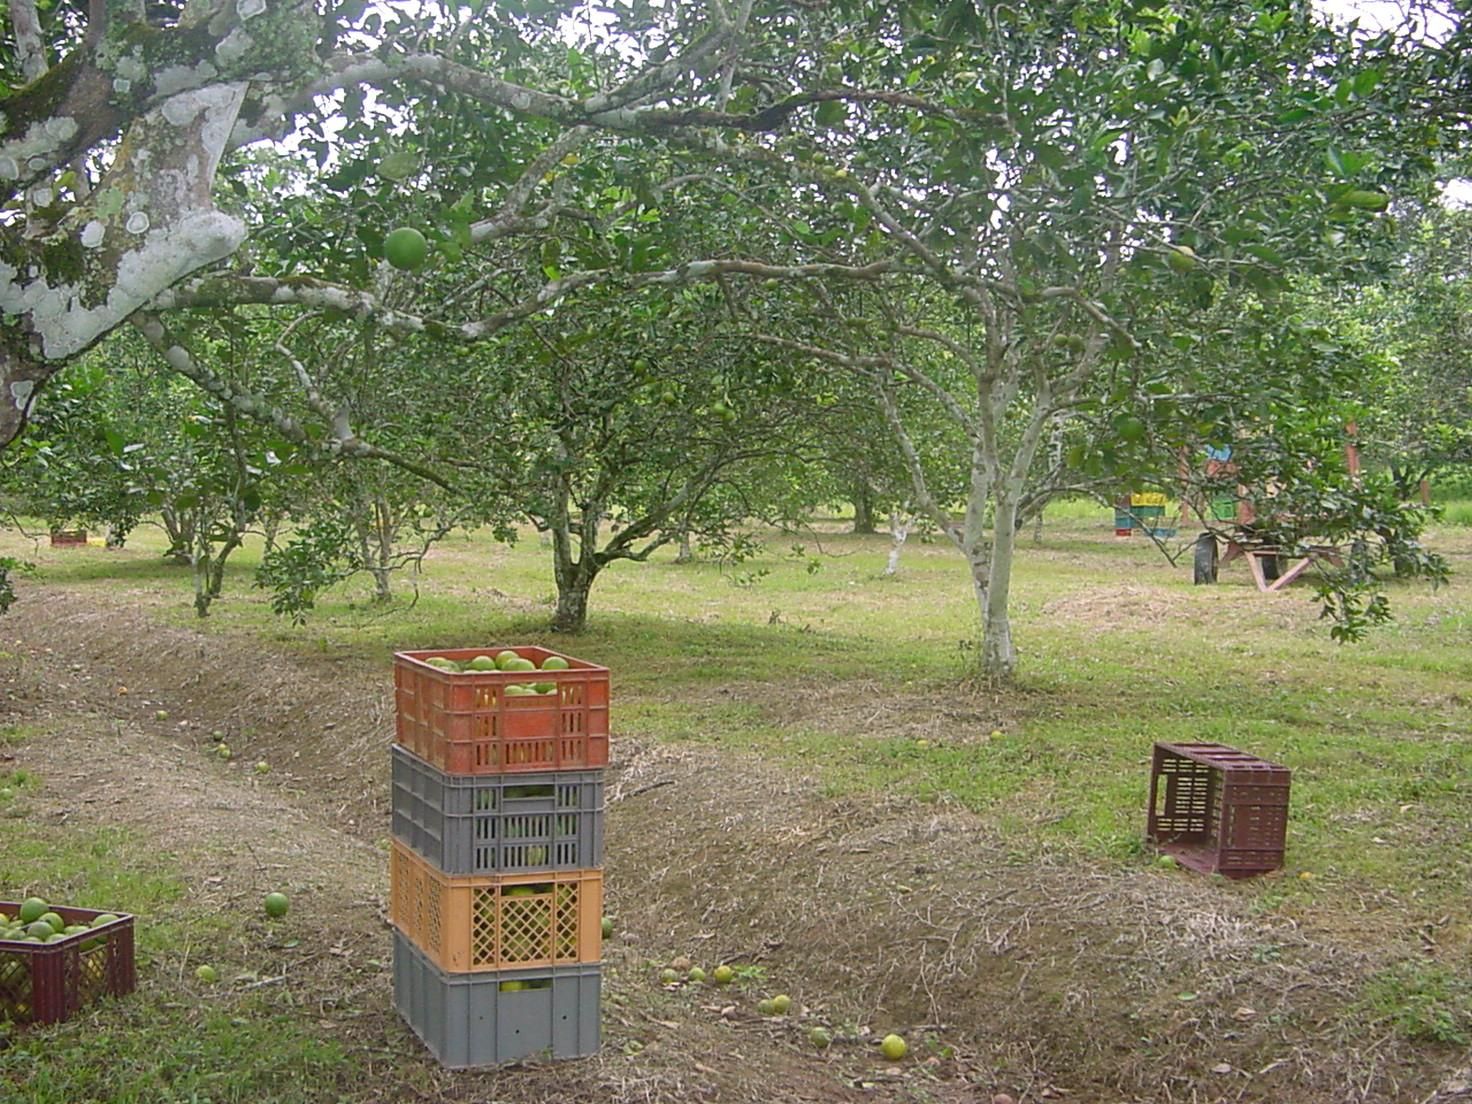 Valencia orange picking (Citrus Sinensis L. Osbeck) in Lejanias (Colombia). Photo: J.A. Cleves-Leguizamo